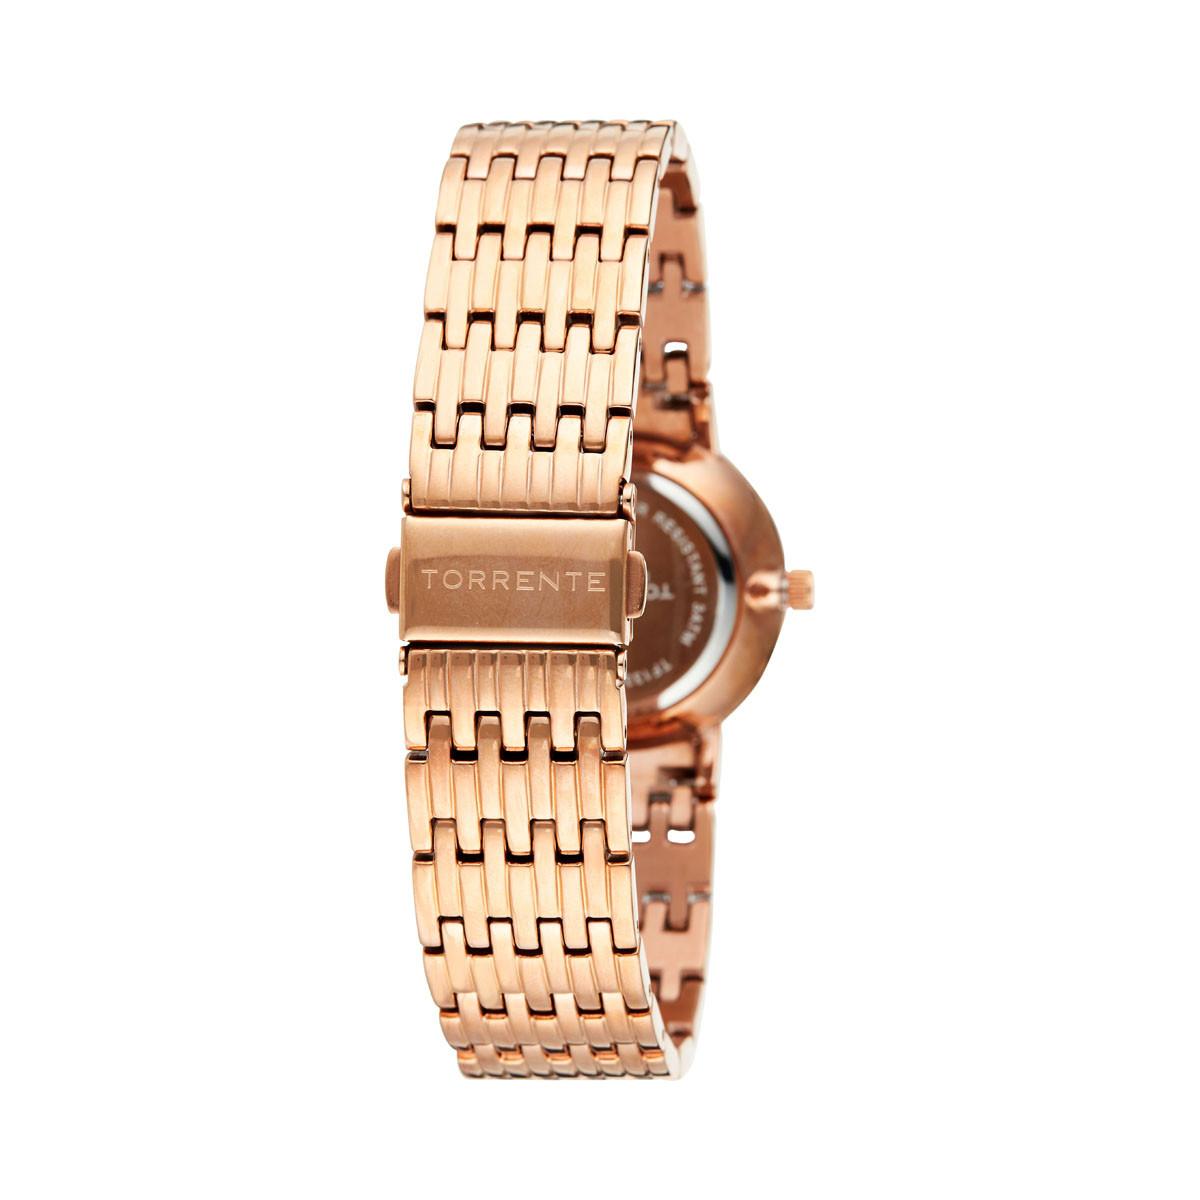 "Torrente - Montre ""Allegra"" Cadran Blanc - Boîtier Acier plaqué Or Rose - Bracelet Acier plaqué Or Rose - Diamants 0.01 carats F"